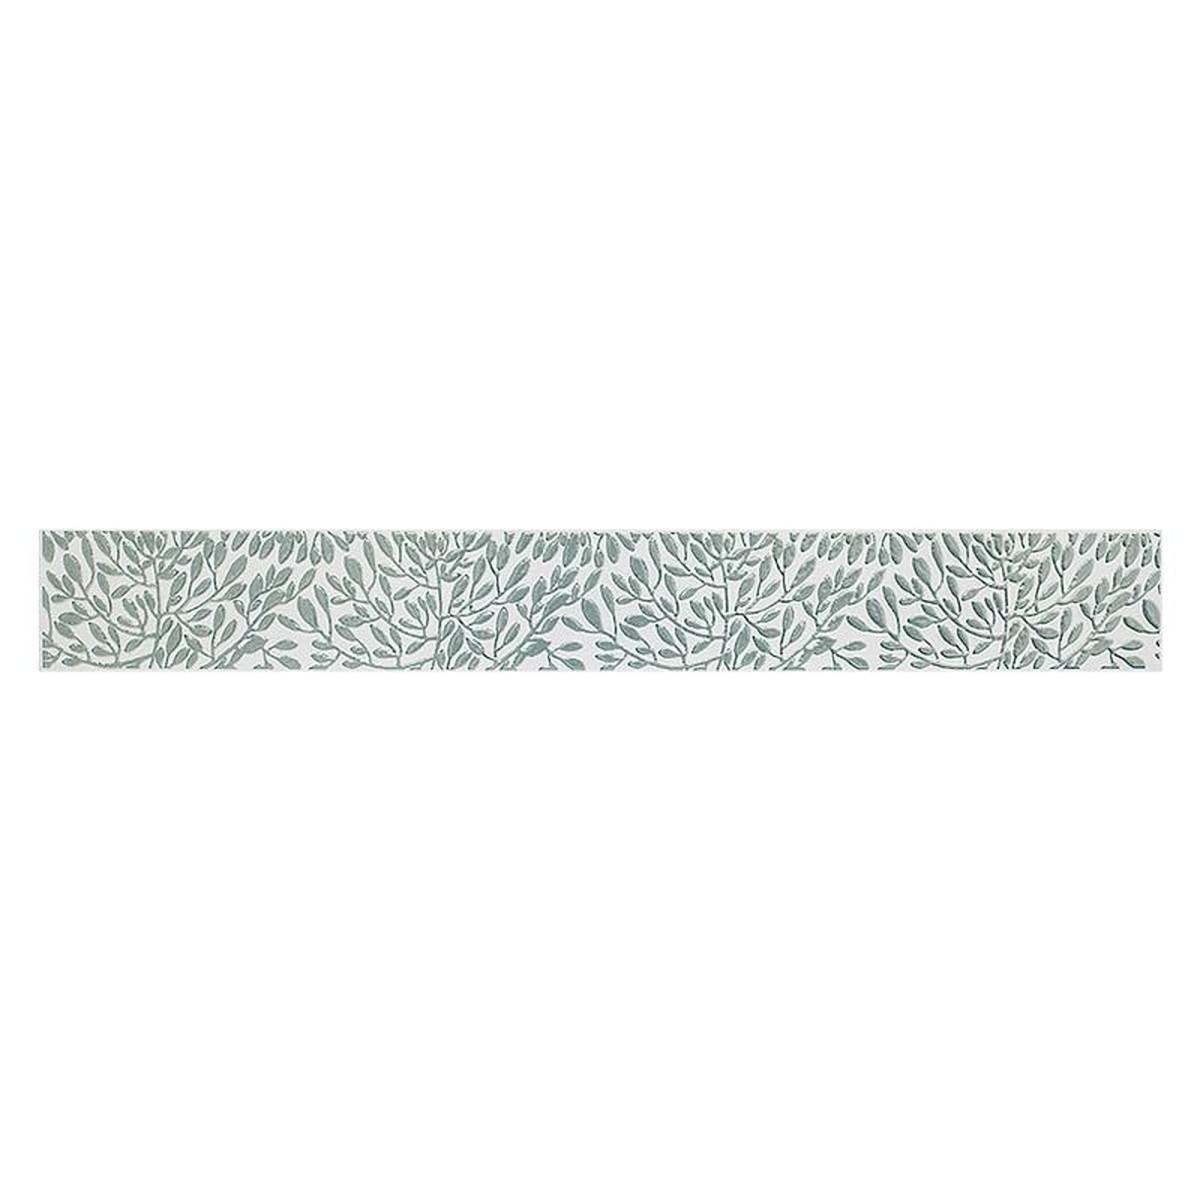 Бордюр «Пленэр» 50х63 см цвет чёрный